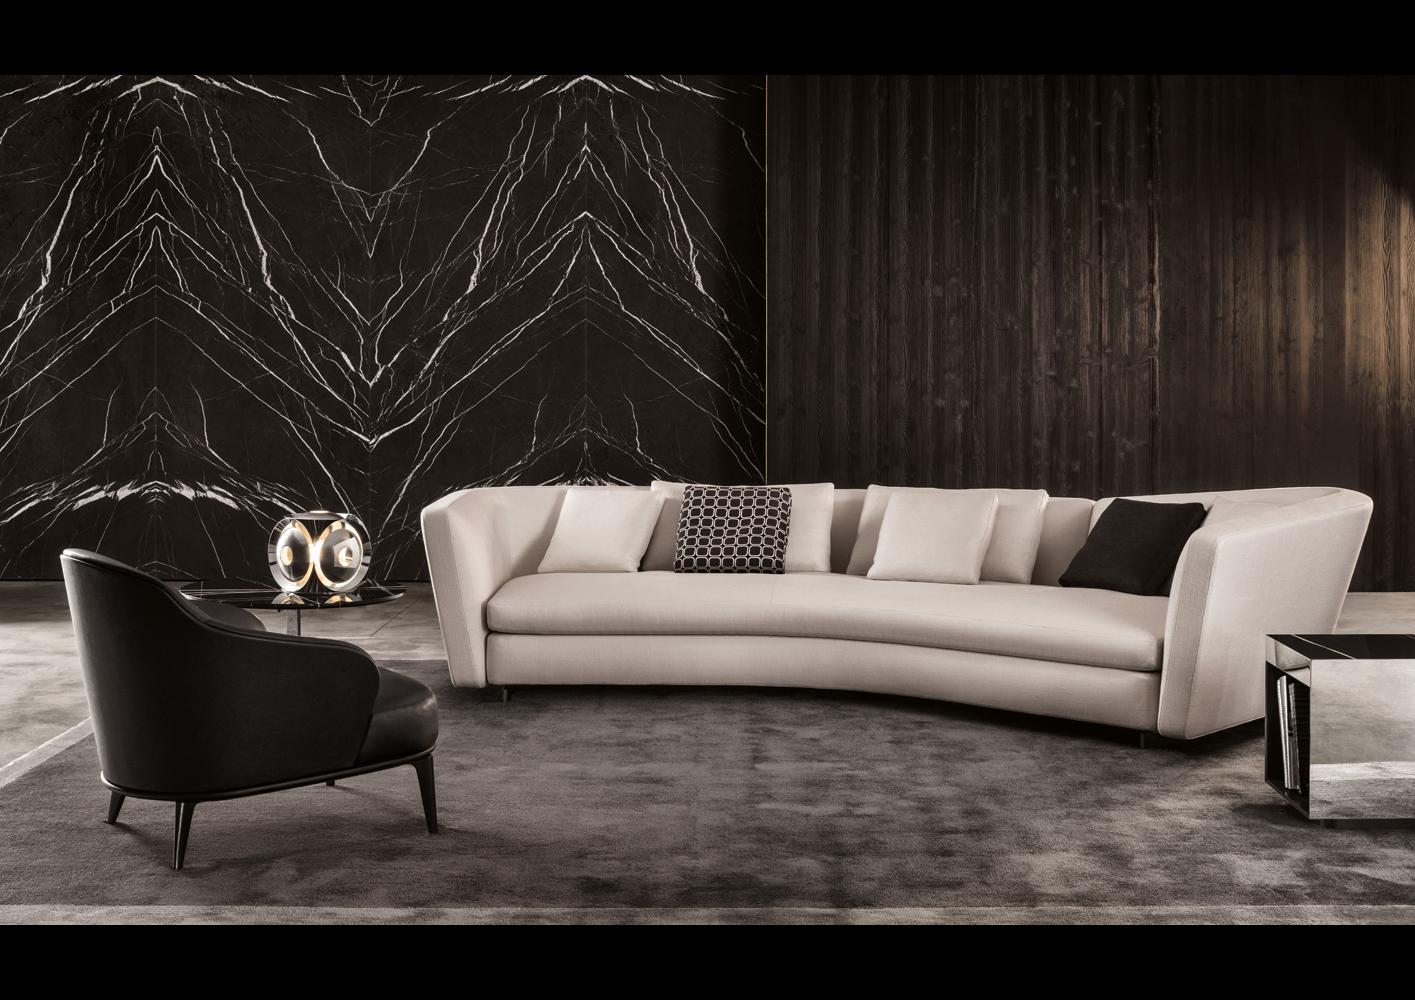 soft sofa material full size leather bed seymour   designed by rodolfo dordoni, minotti ...